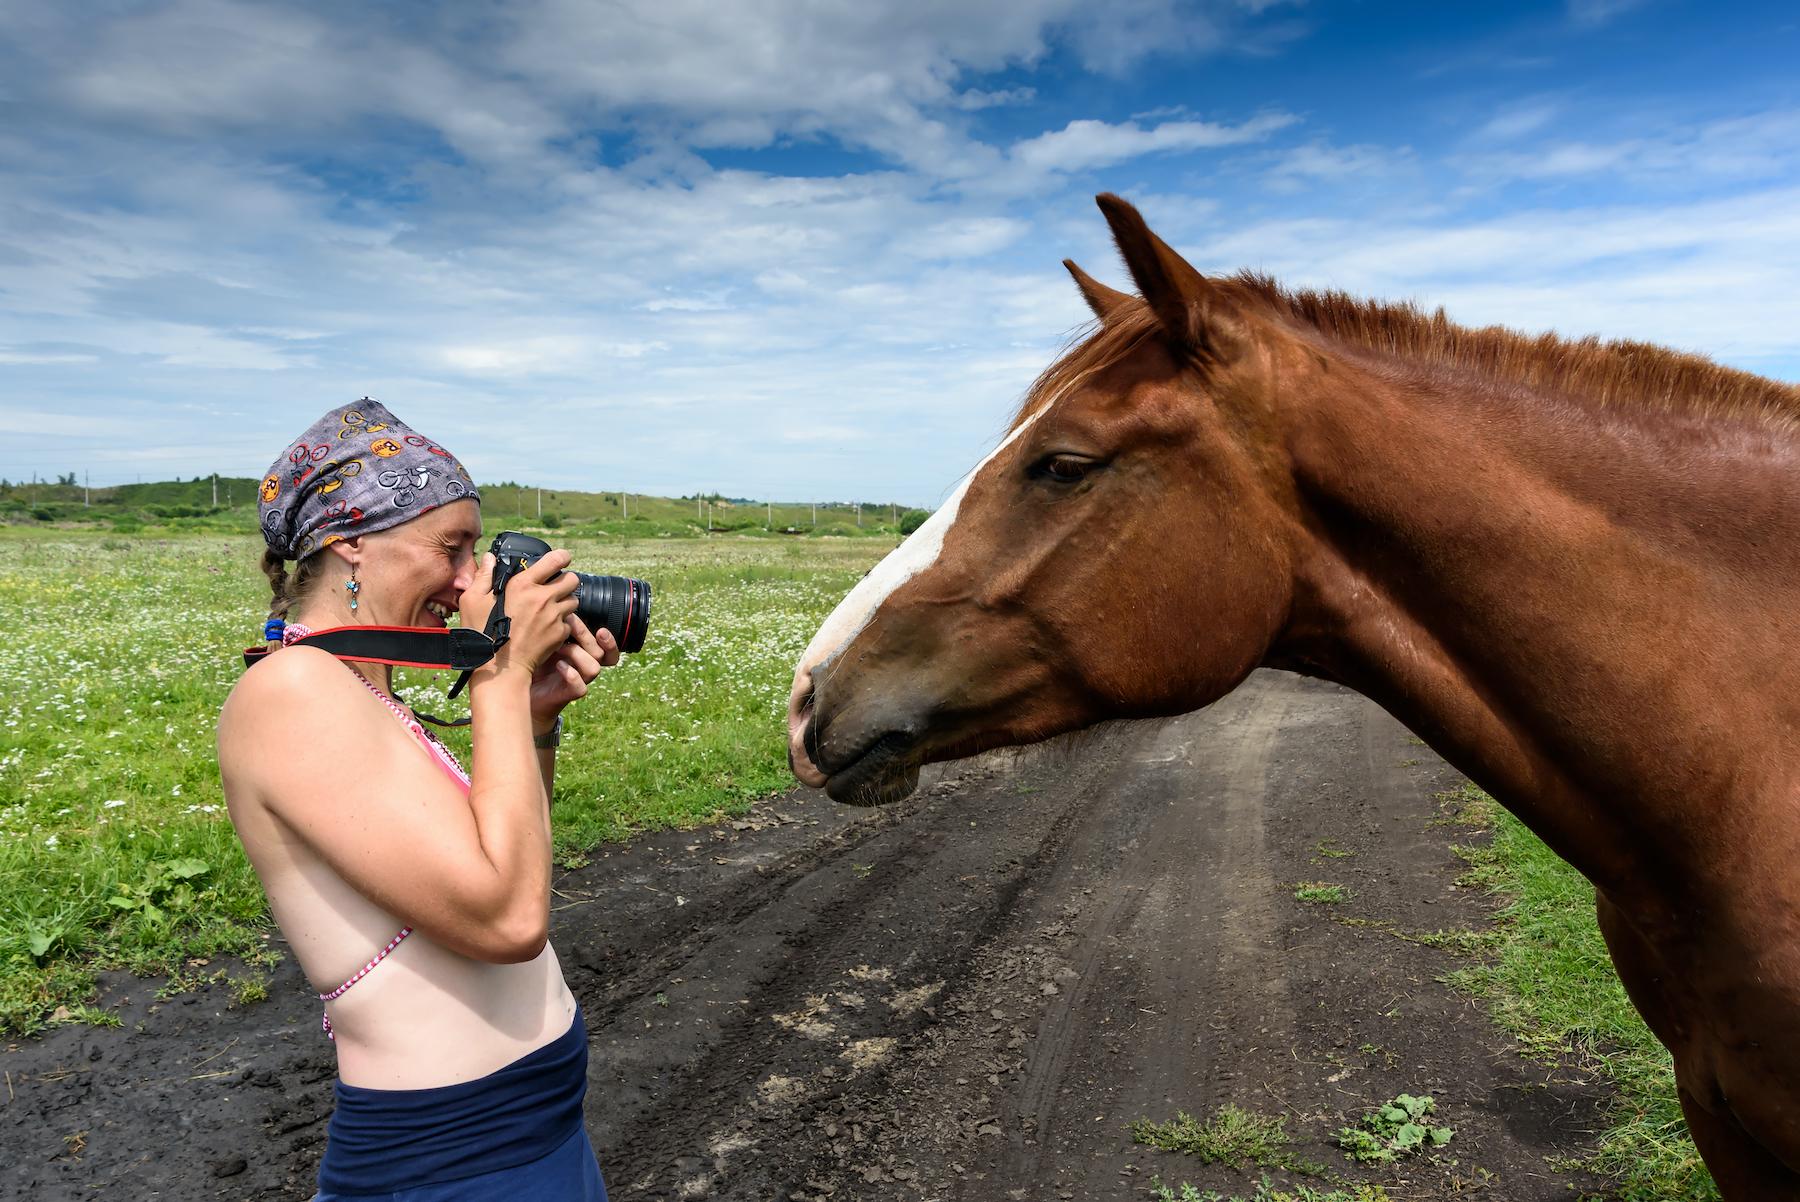 15 Ways To Make Money With Horses